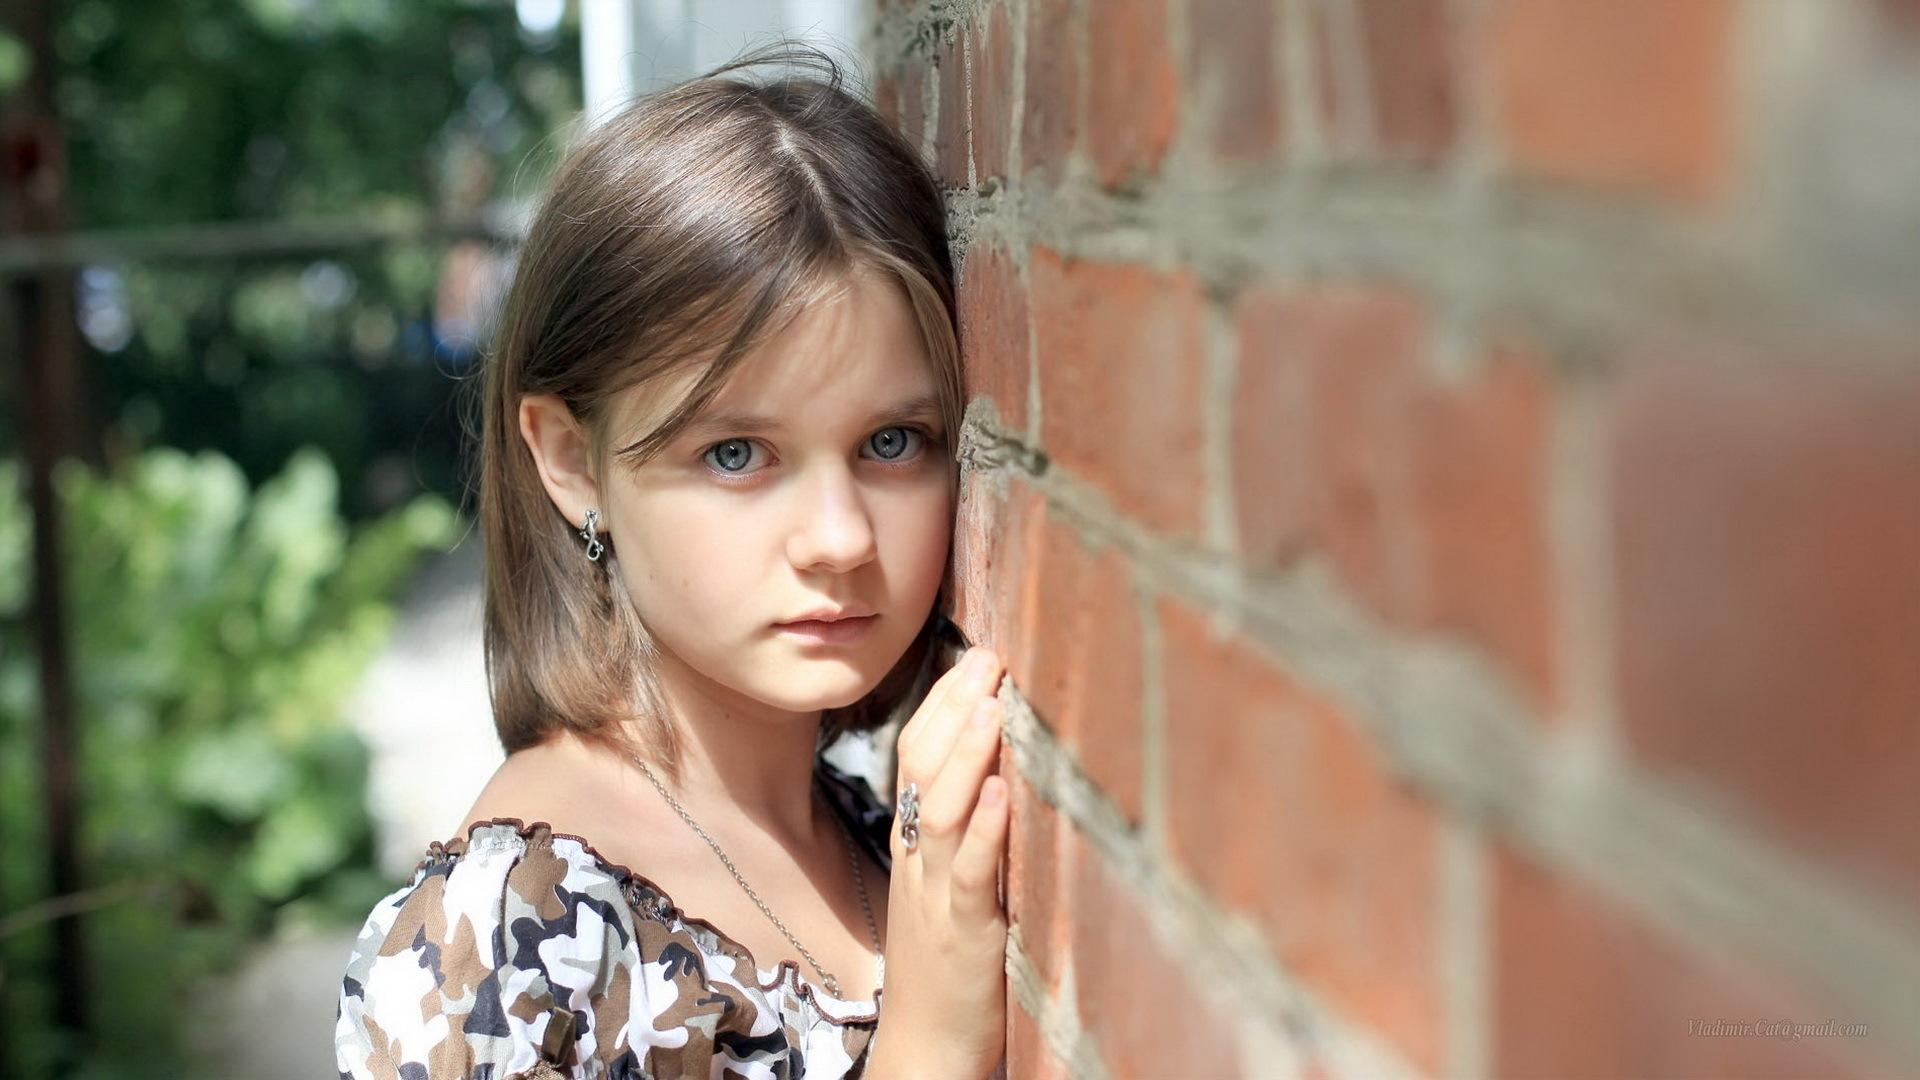 Girl, Hairstyle, Long Hair, Child Model, Sadness Wallpaper - Sad Little Girl , HD Wallpaper & Backgrounds